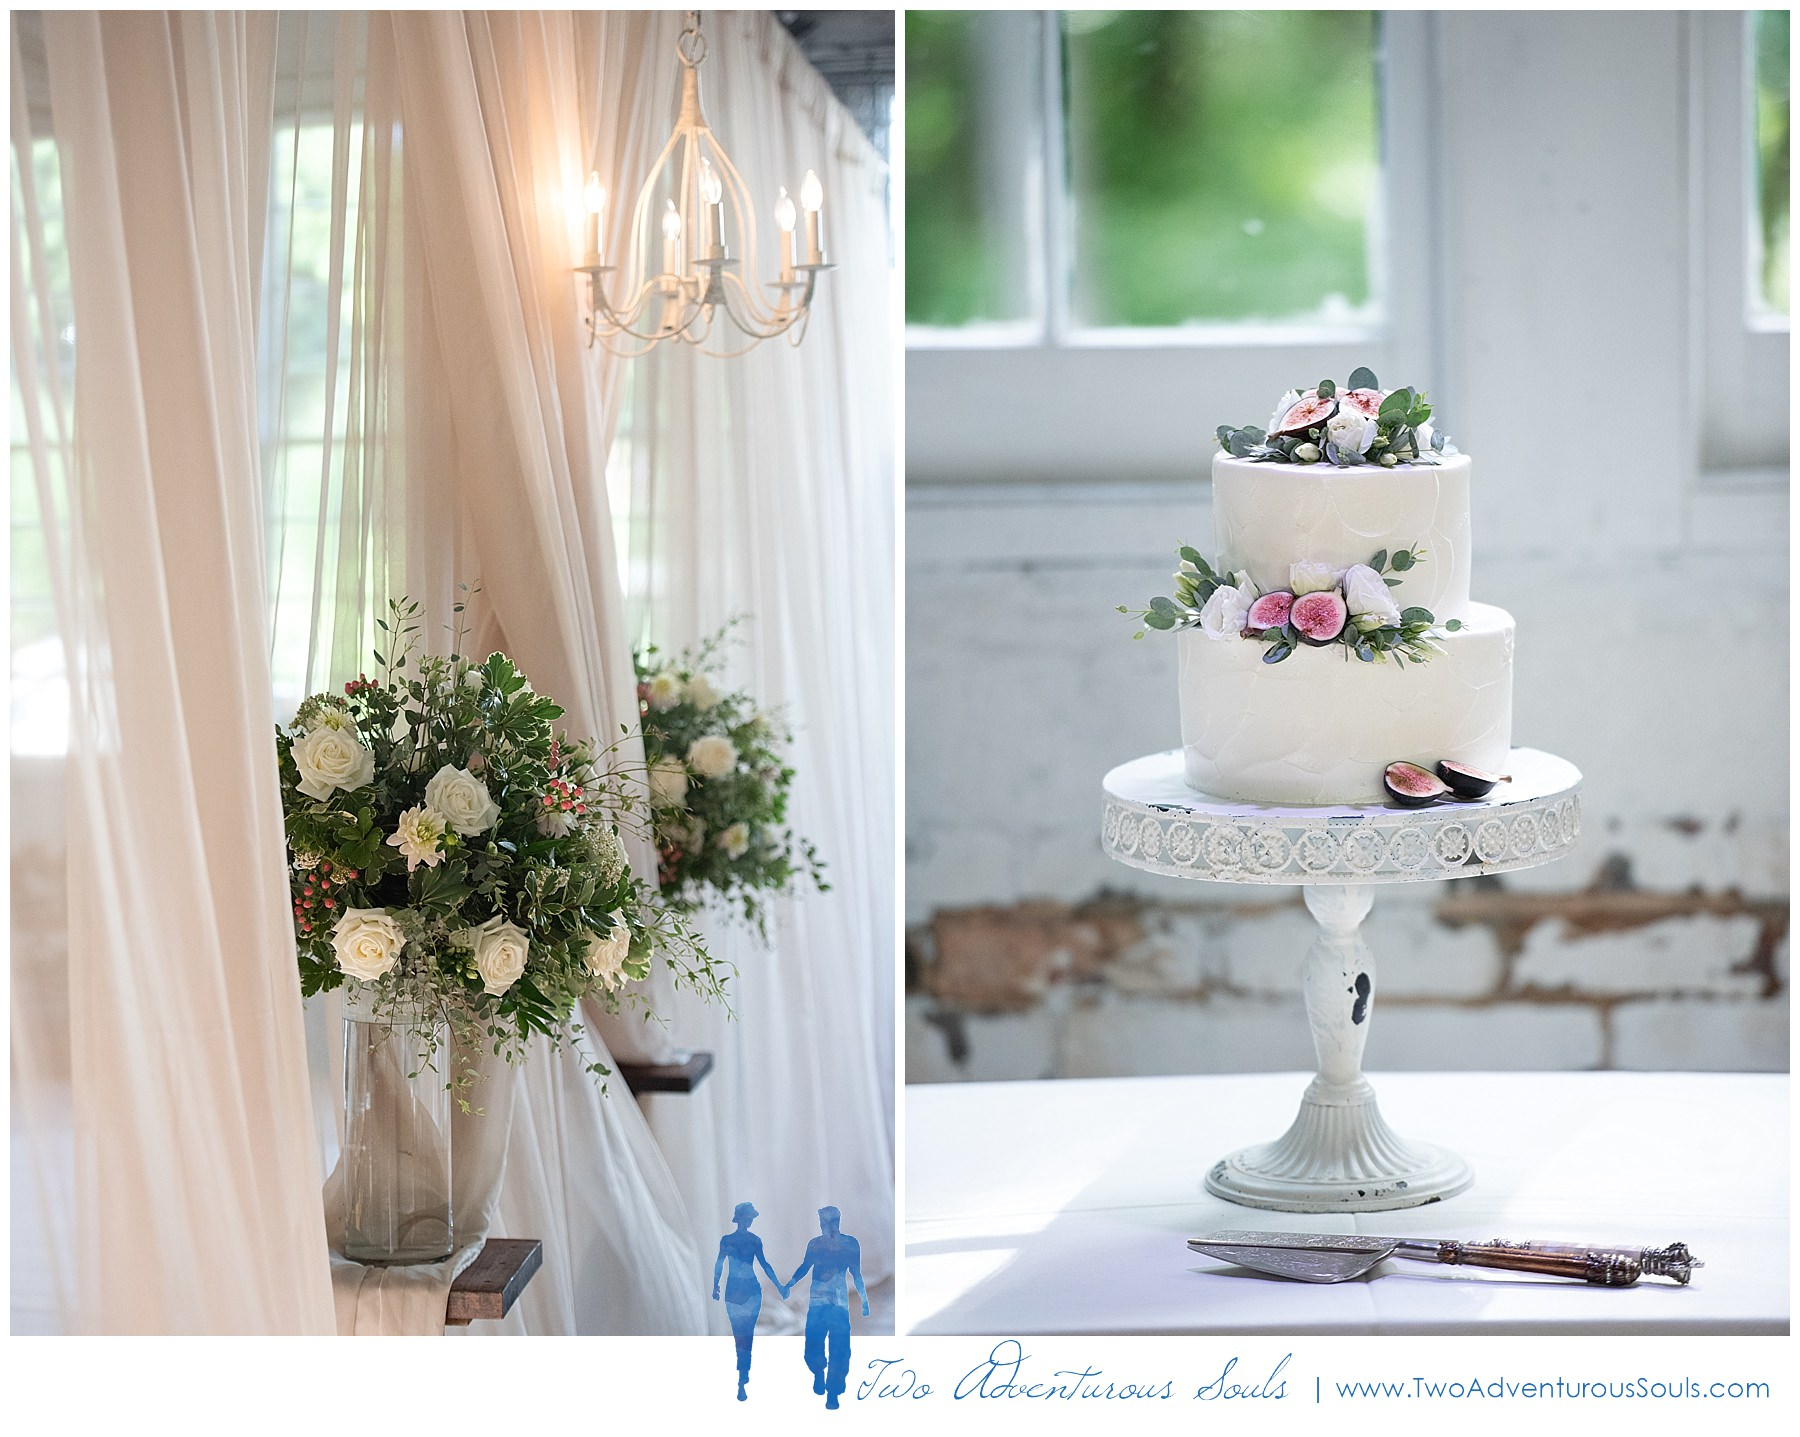 Connecticut Wedding Photographers, Lace Factory Wedding Photographers, Two Adventurous Souls - 083119_0031.jpg